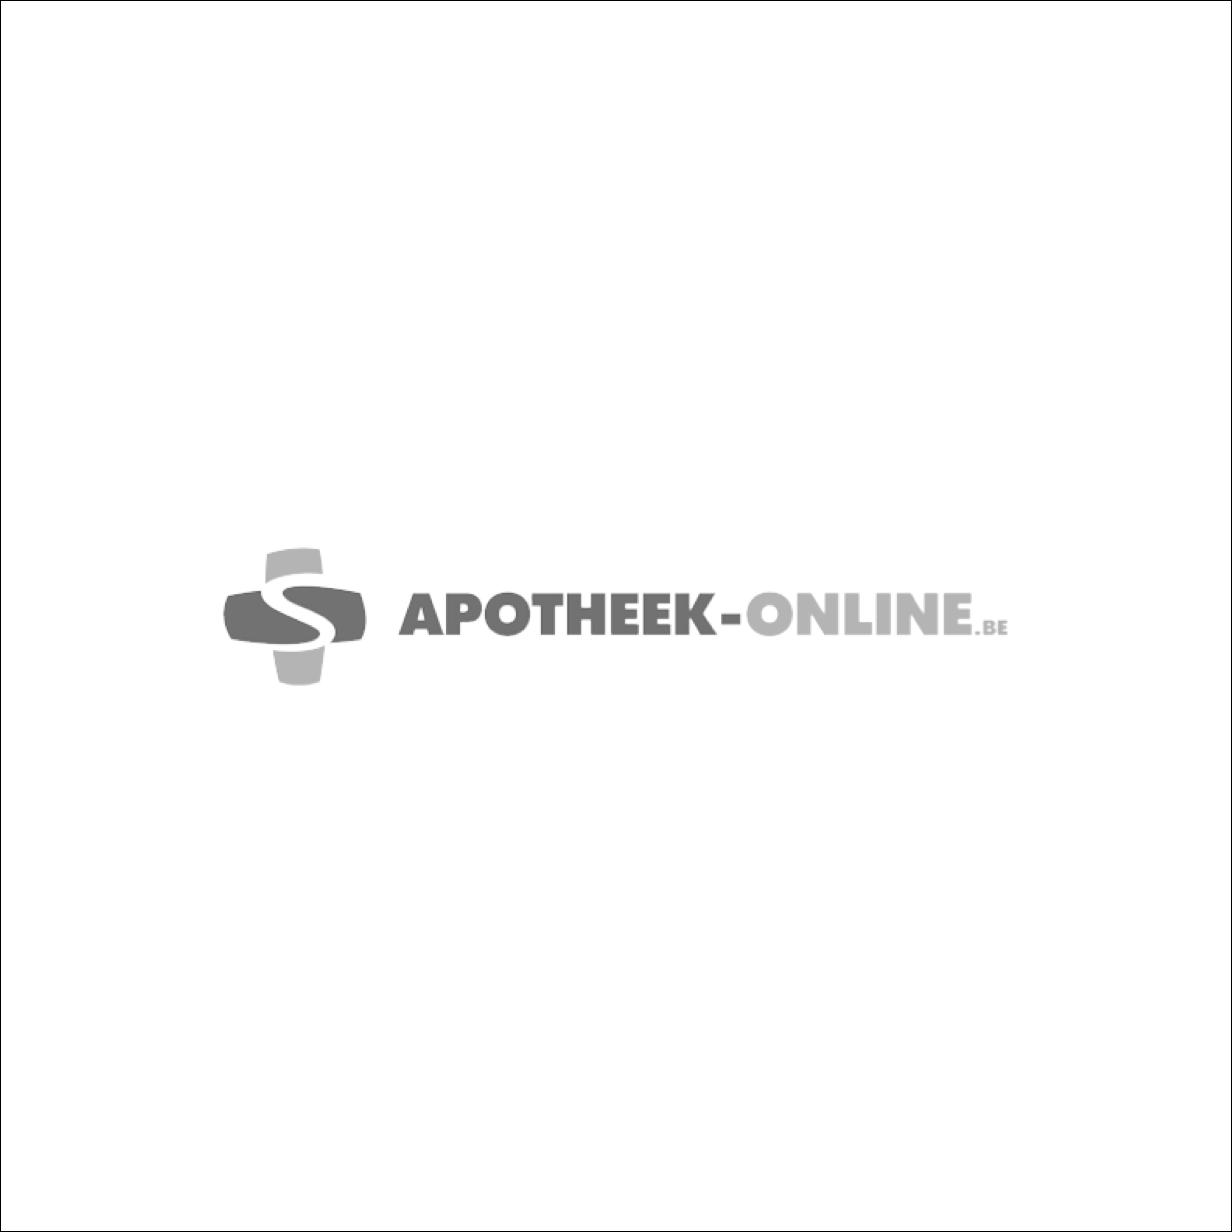 La Roche-Posay Toleriane Correcteur de Teint Fluide 13 Beige Sable Tube 30ml